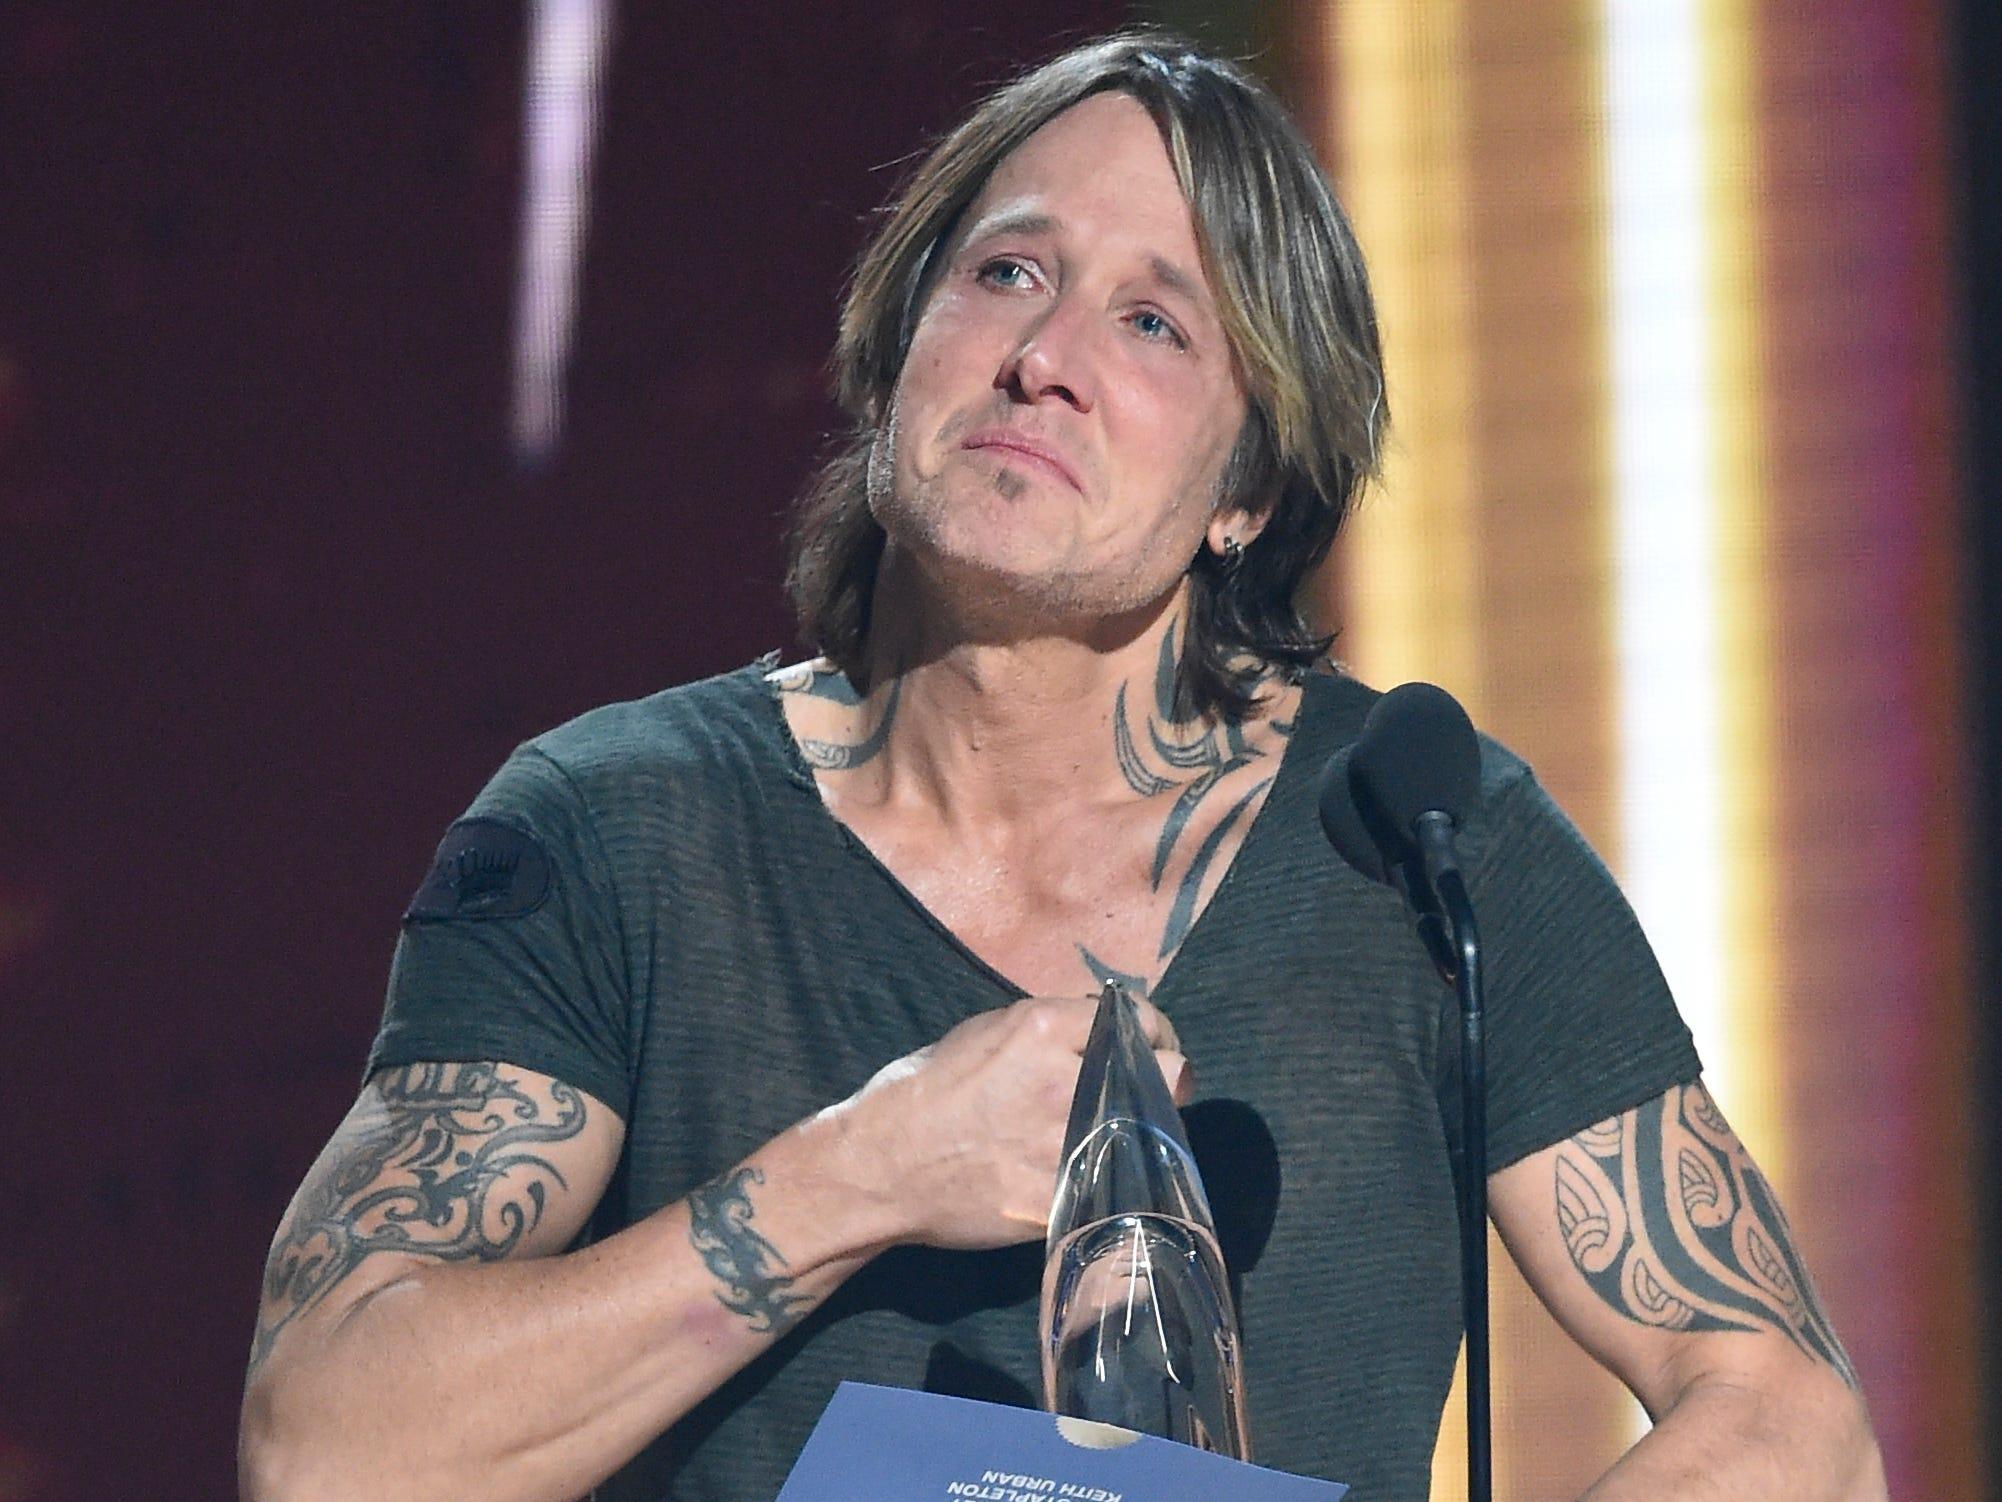 CMA Awards 2018: Keith Urban upsets, Chris Stapleton steamrolls